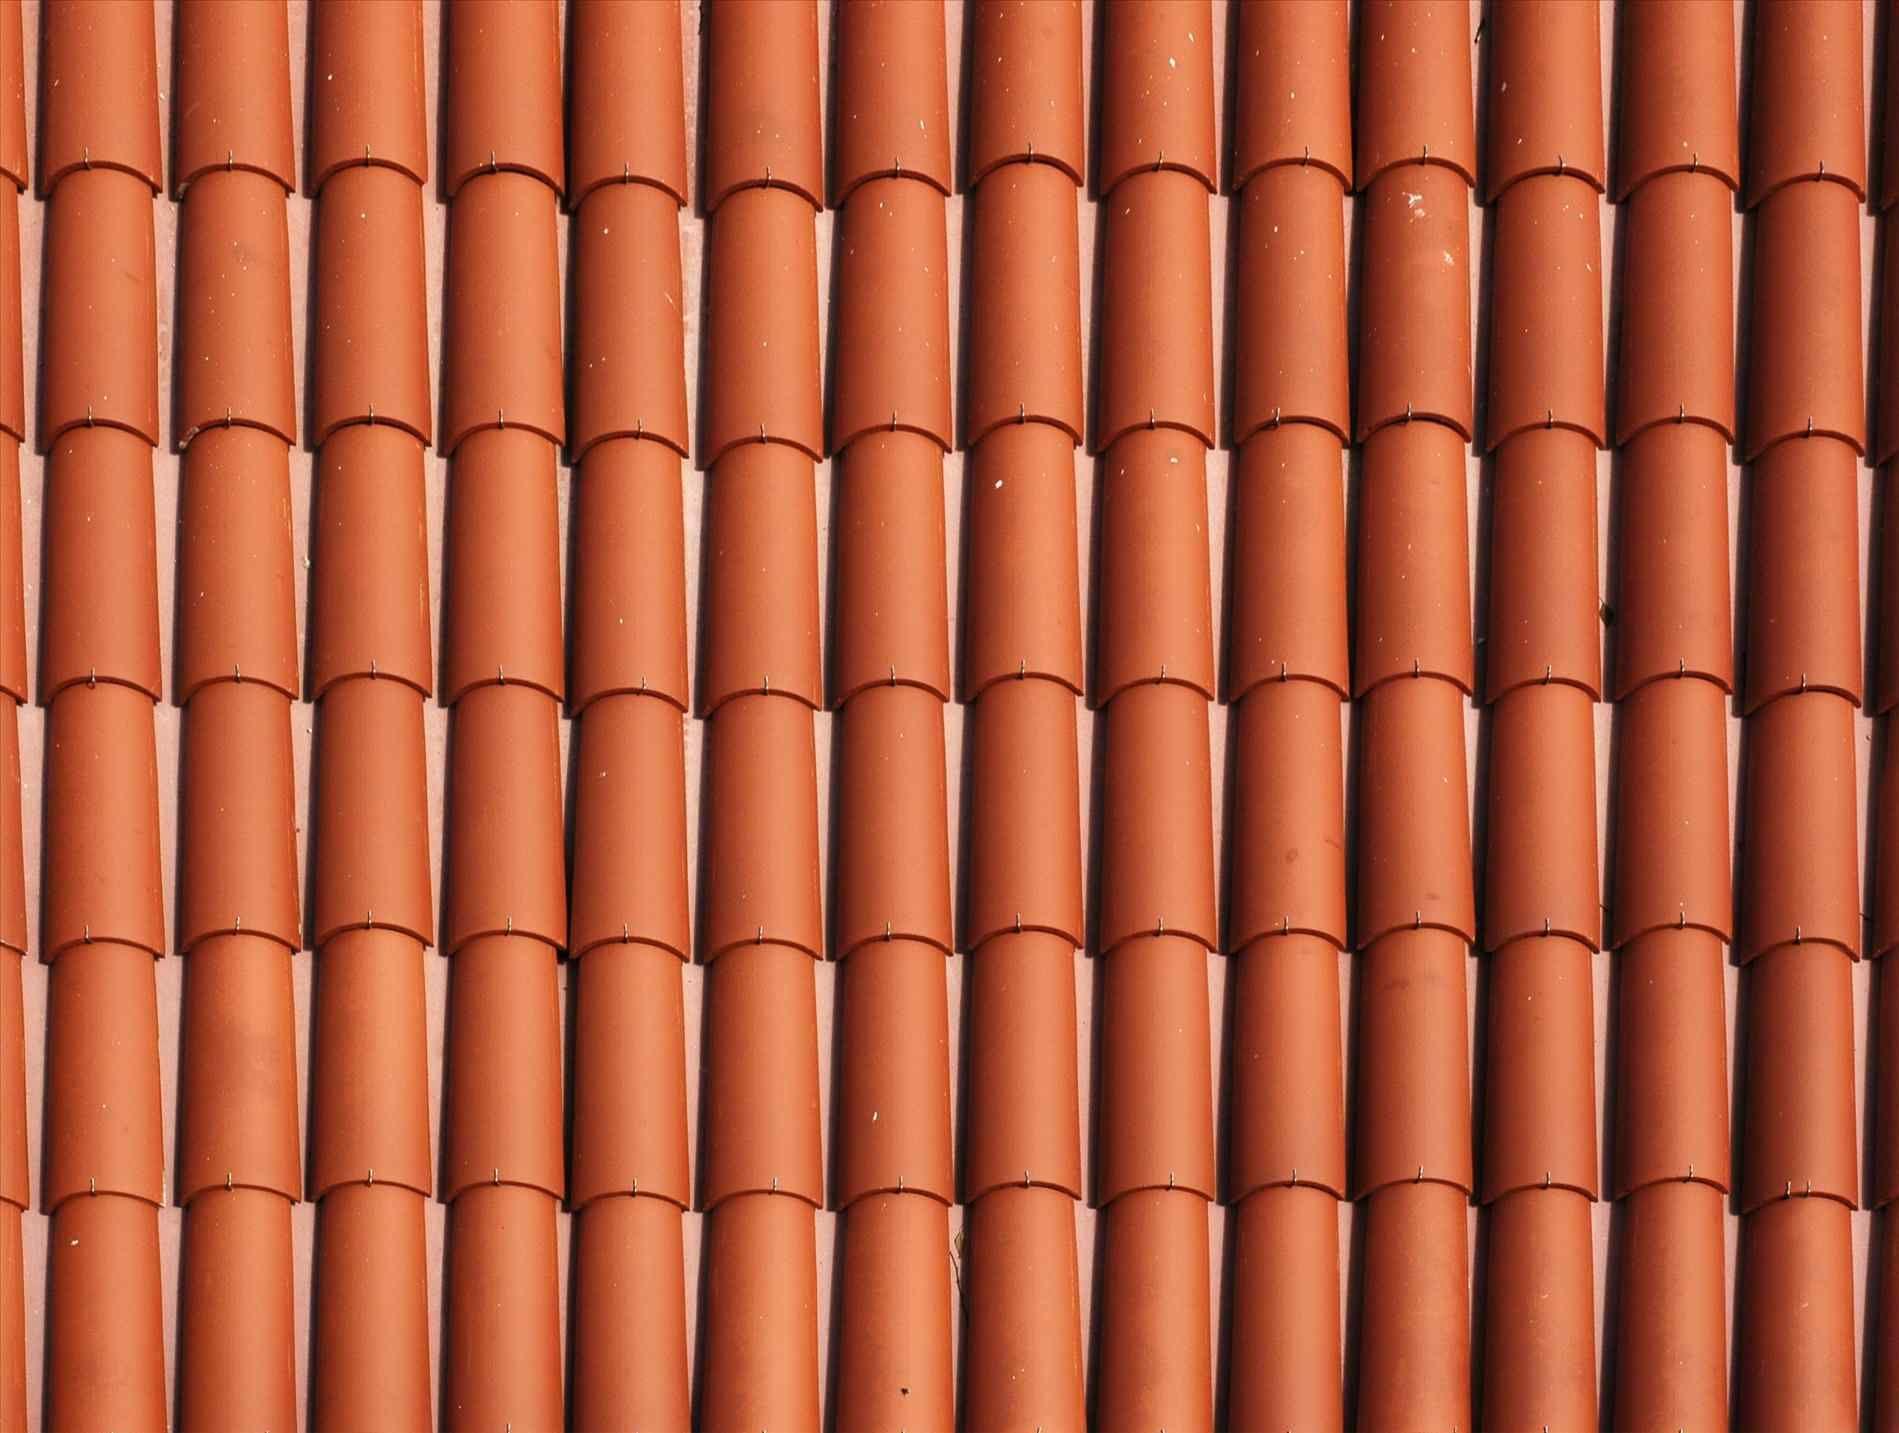 Spanish Style Roof Shingles Terracotta roof tiles, Roof